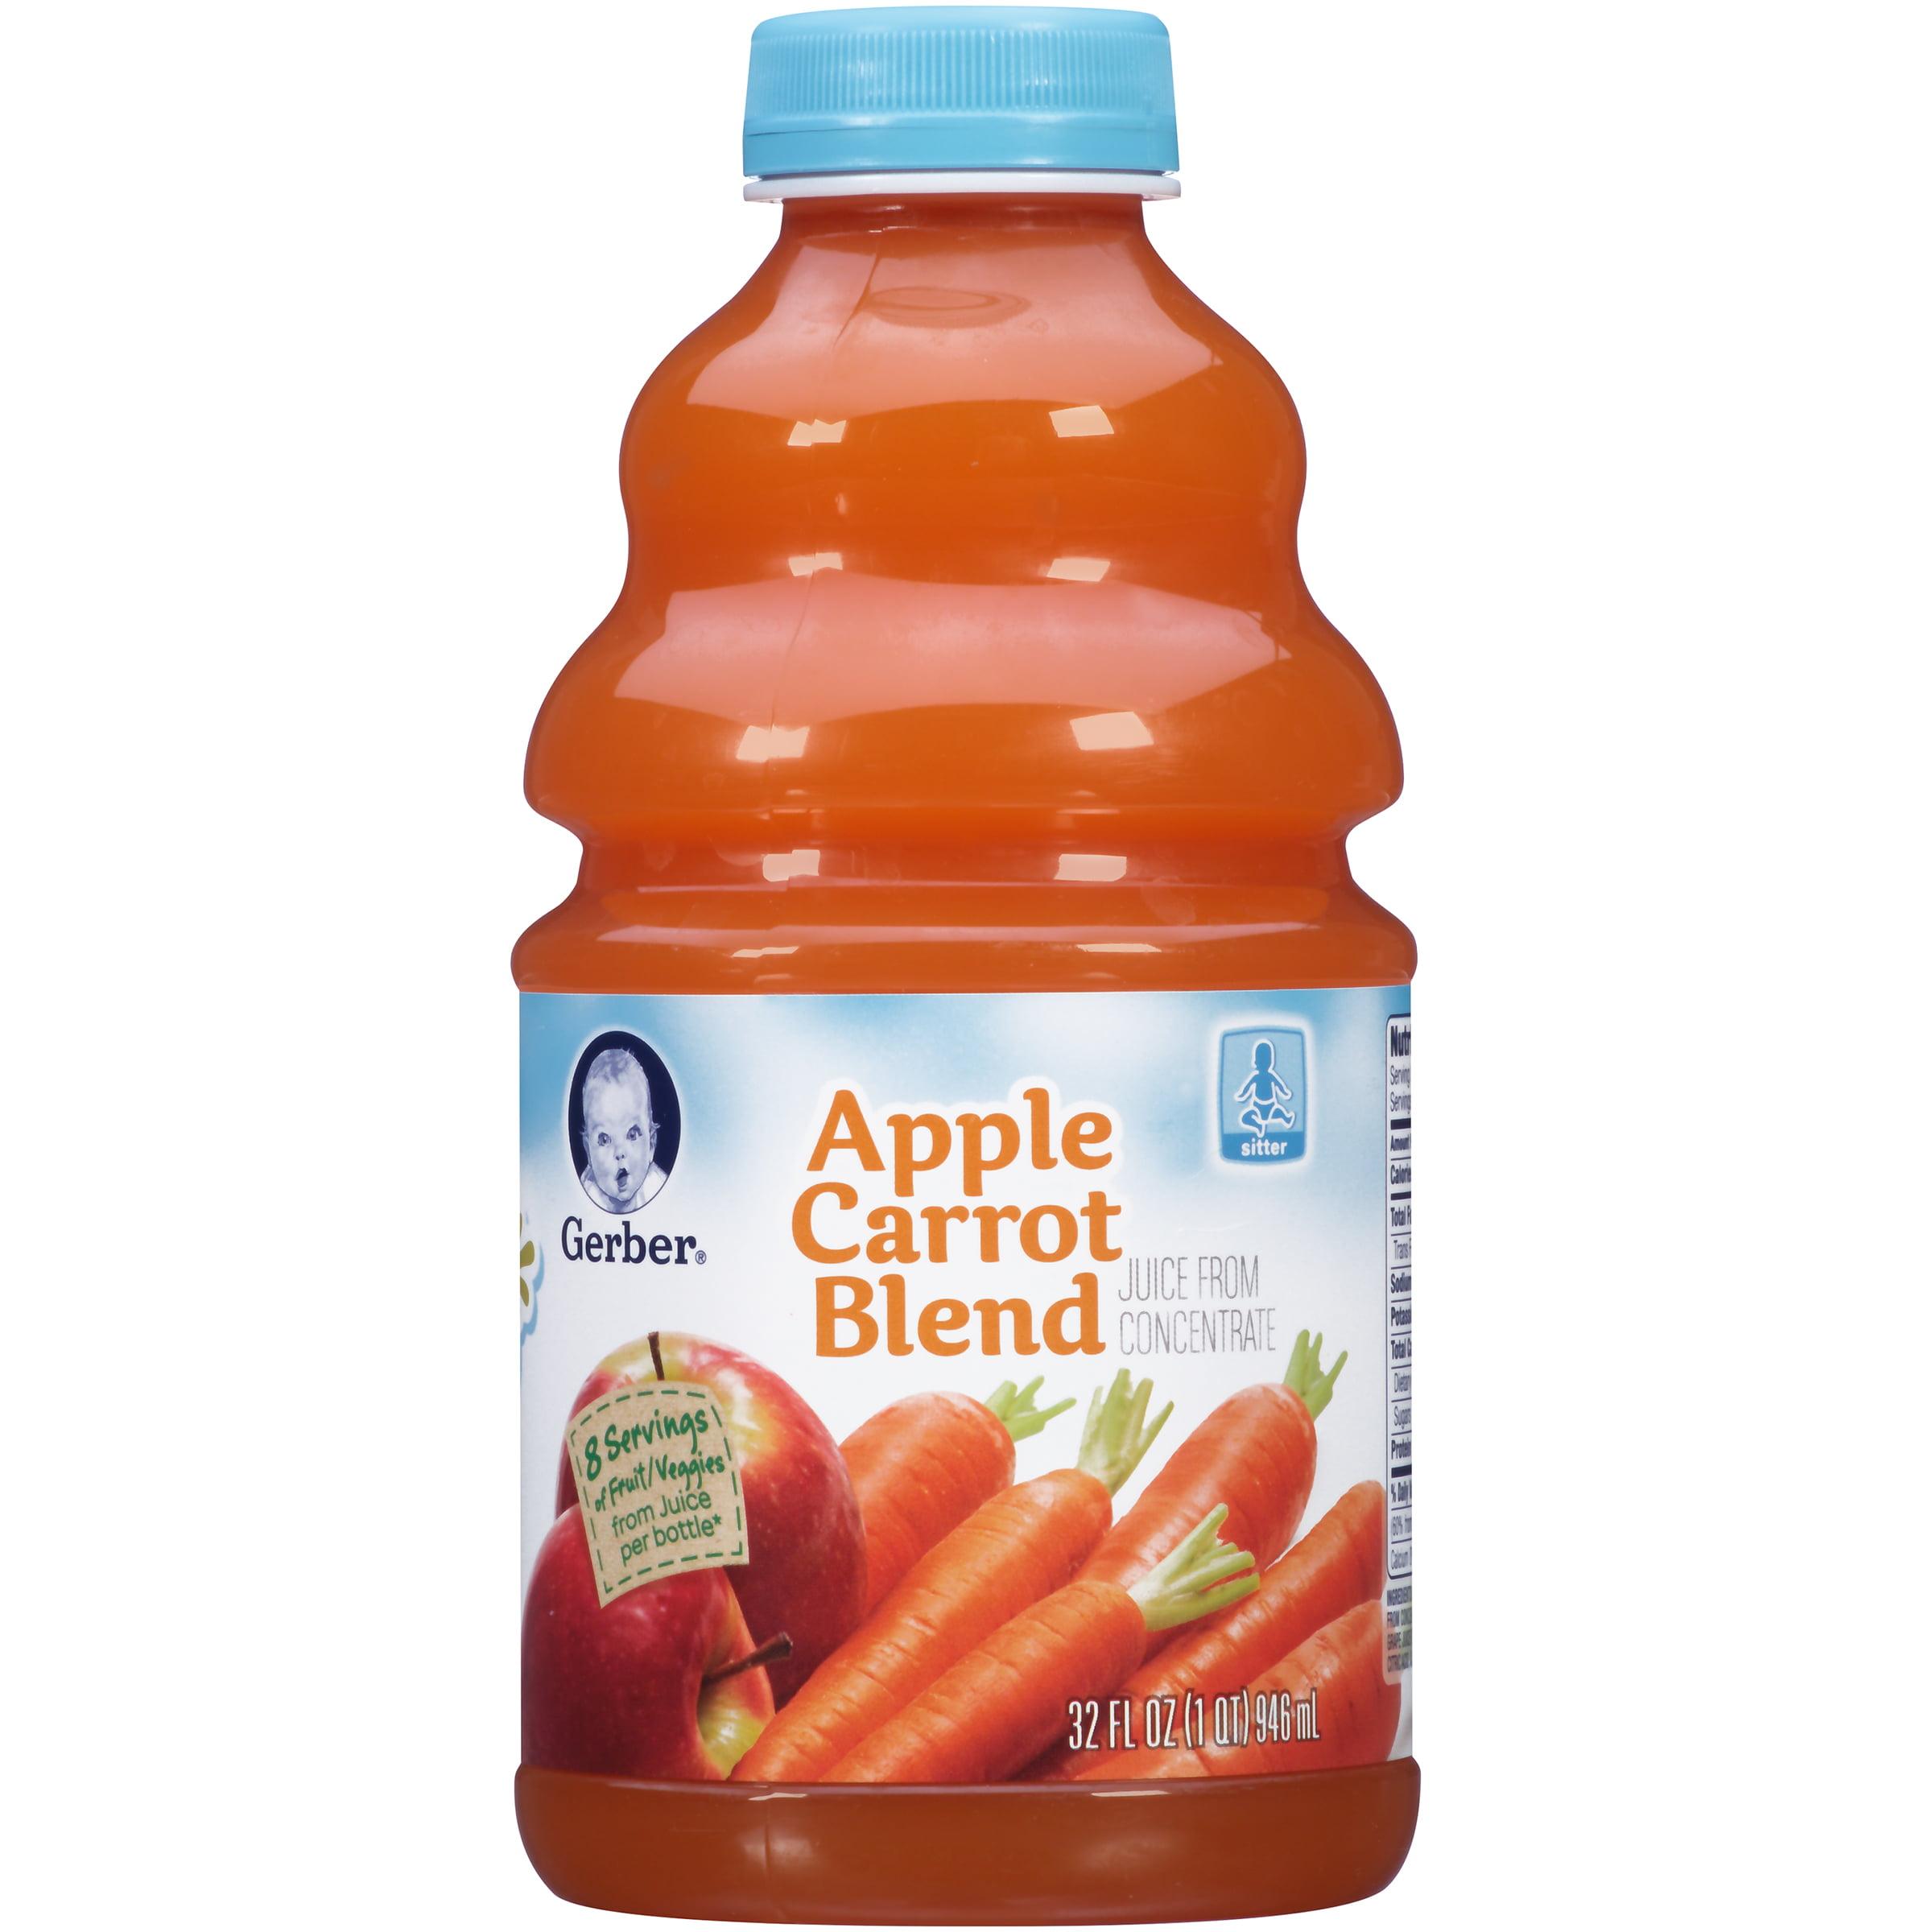 Gerber Apple Carrot Juice Blend, 32 fl oz by GERBER JUICE